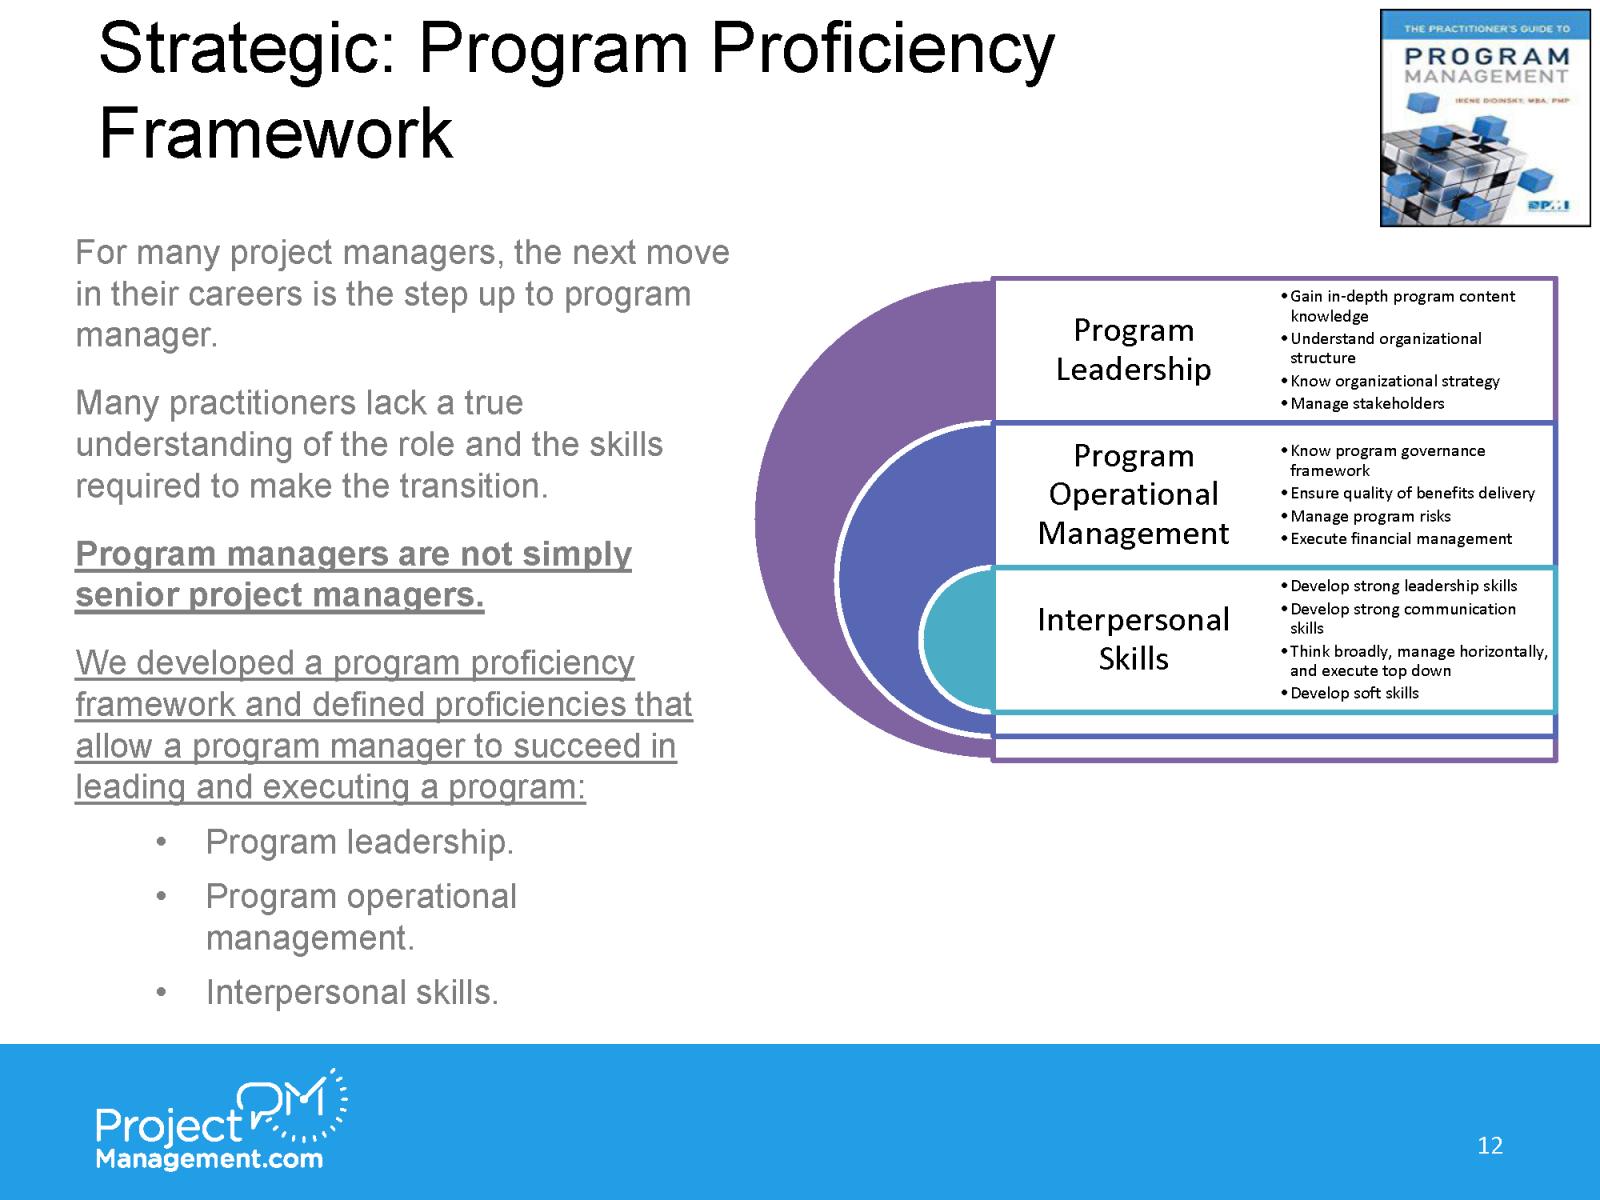 ProjectManagementcom webinar_Irene Didinsky_05112018_FinalFinal_Page_16